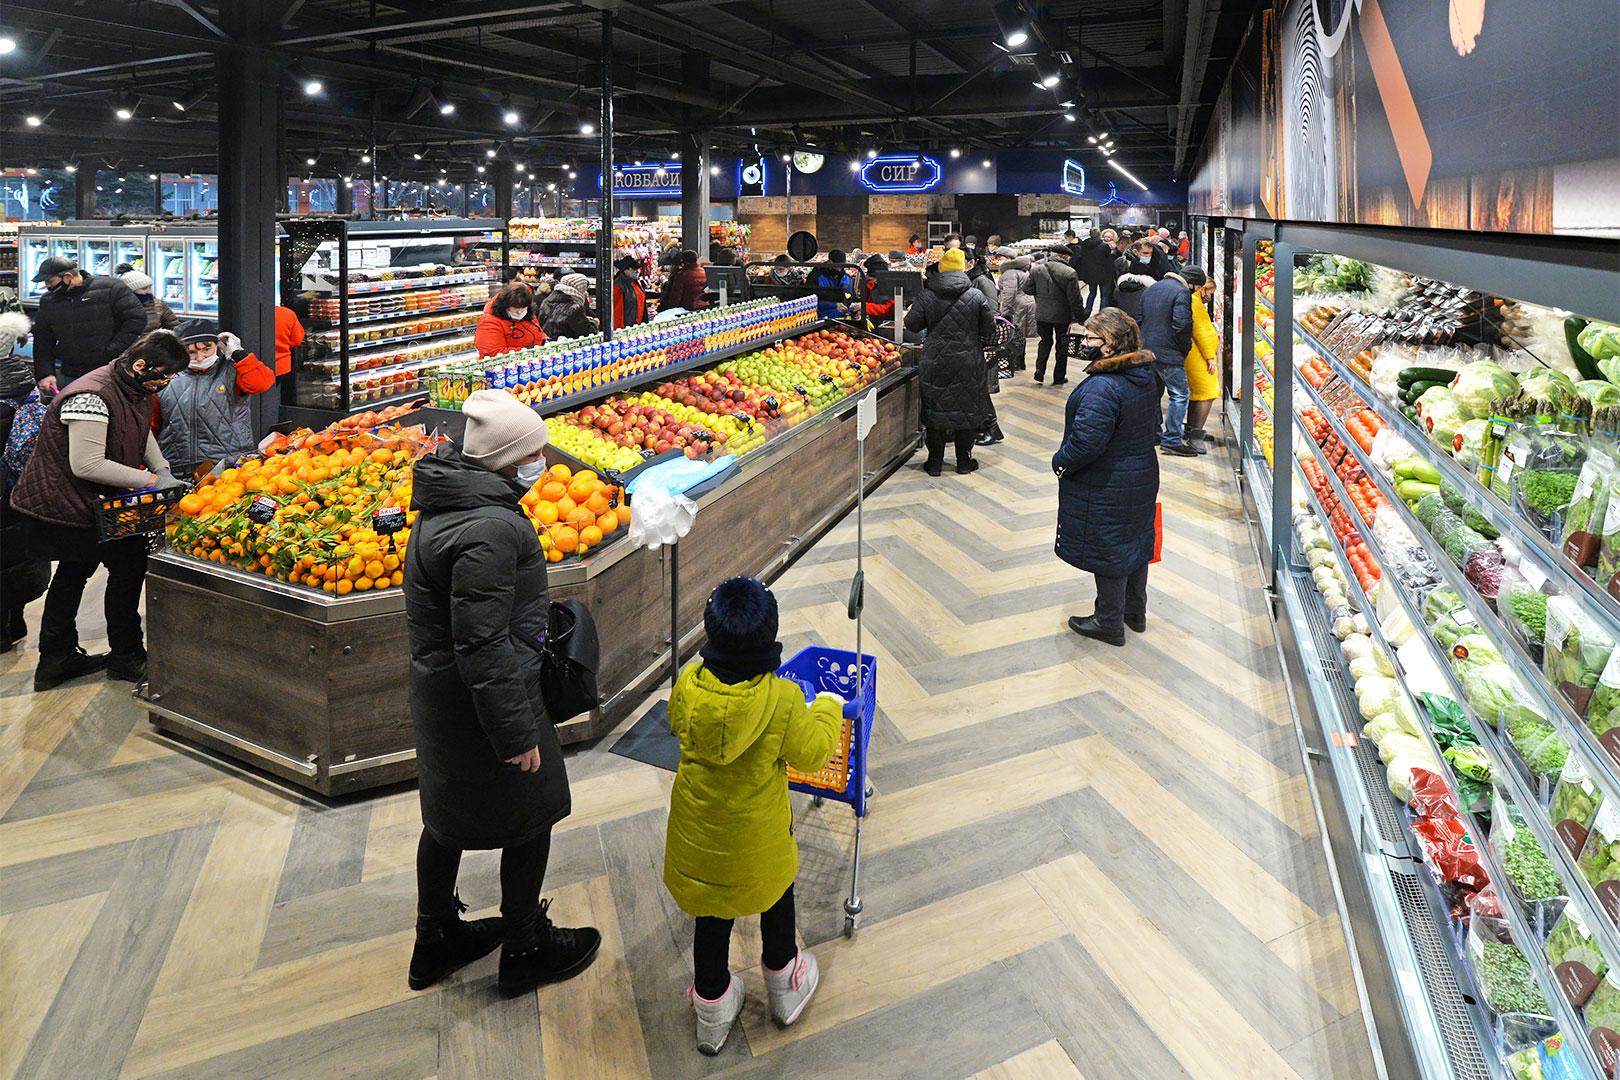 Specialized units for vegetables and fruit sales Missouri VF MC 110 VF self 110-DBM, Indiana MV 080 FV O 205-DLM